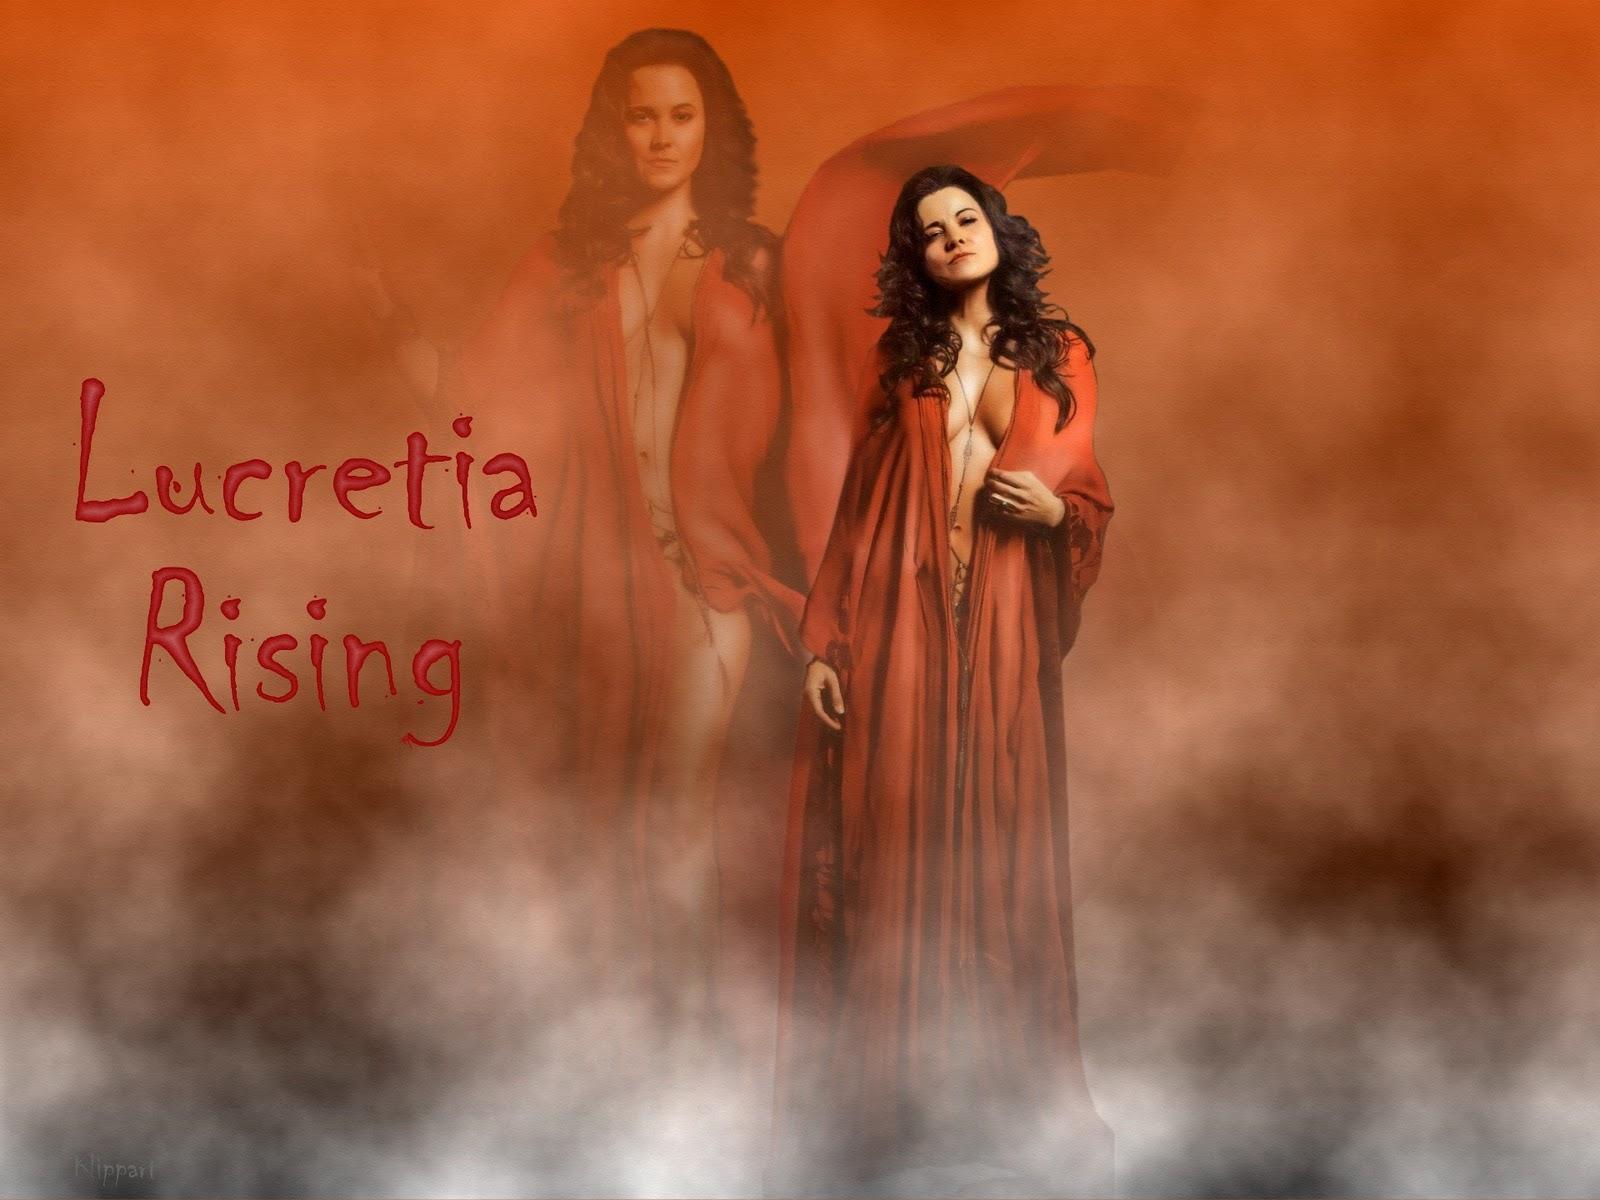 http://4.bp.blogspot.com/-6PmOU_jEv_o/TxJBcjRQDHI/AAAAAAAAE38/y0gb1A5oGag/s1600/Lucretia+Rising.jpg